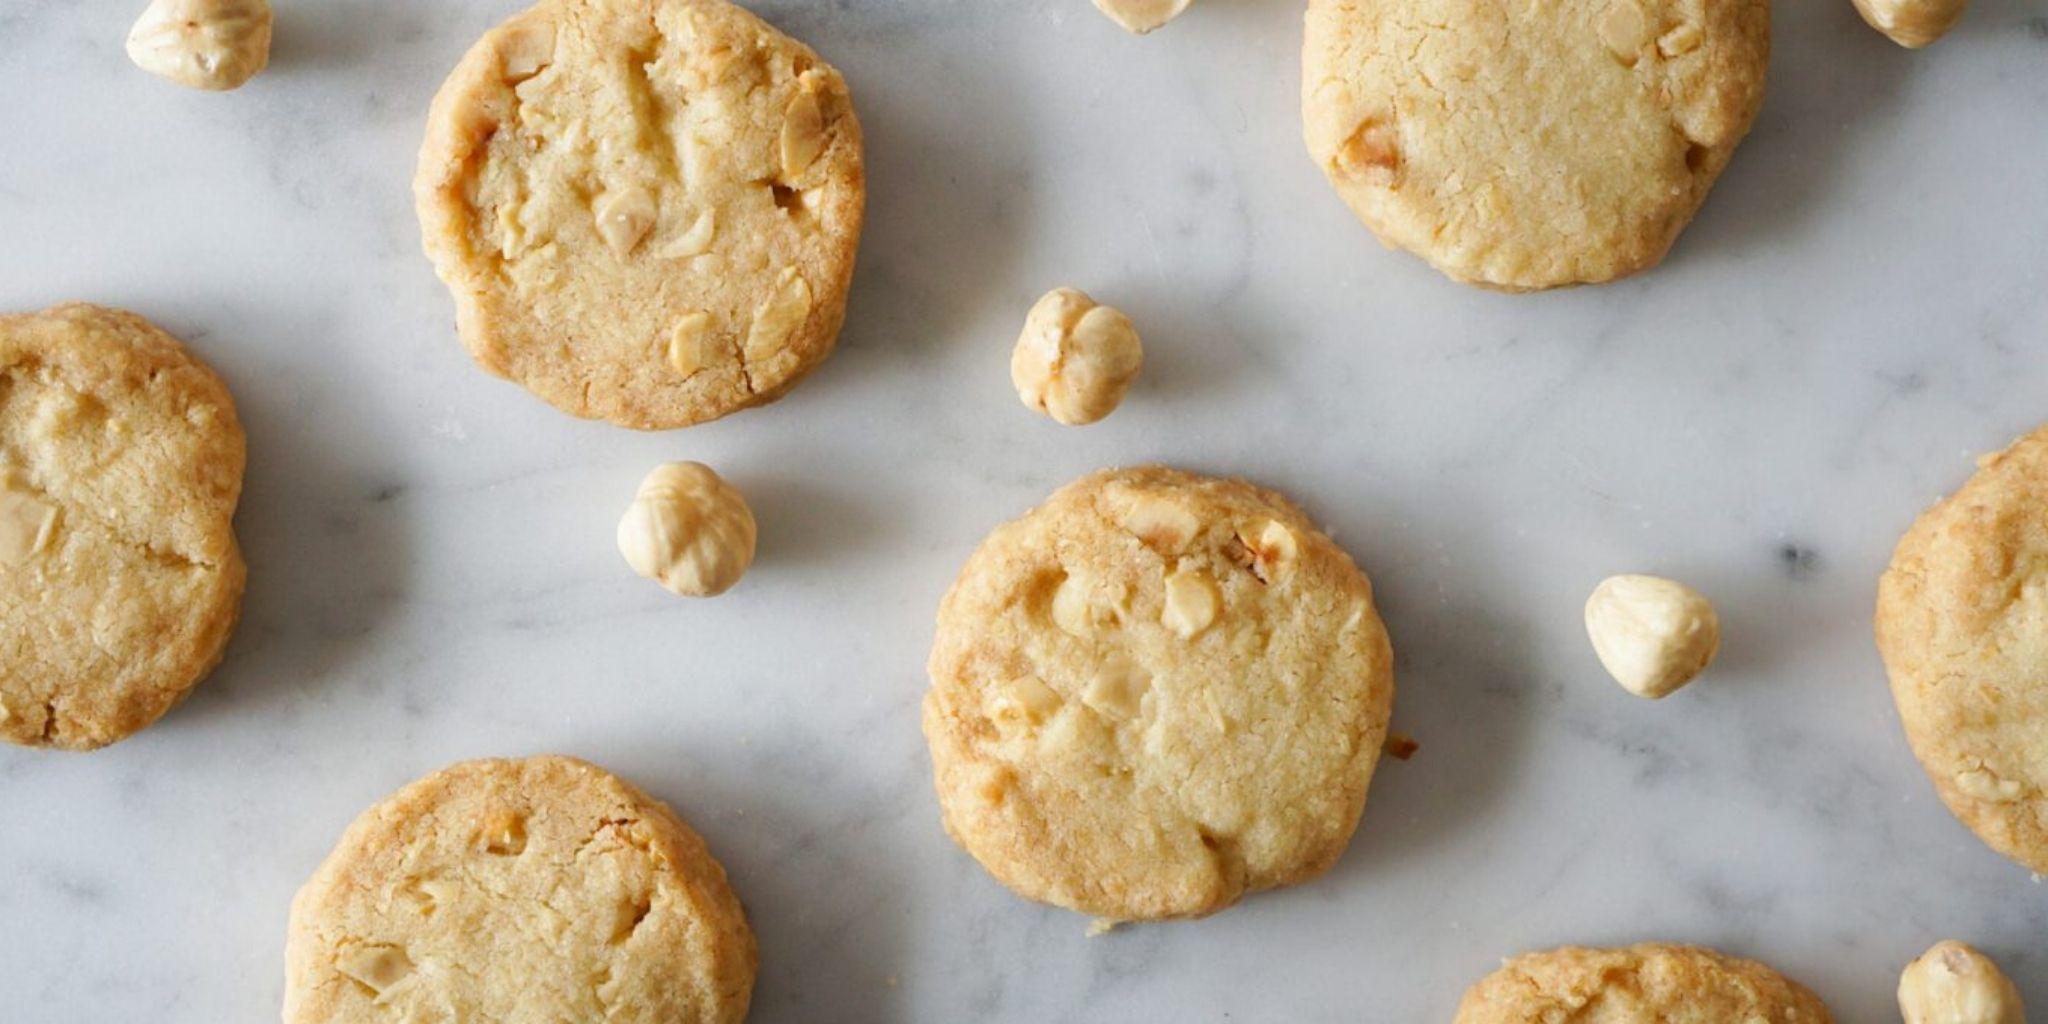 De nemmeste småkager